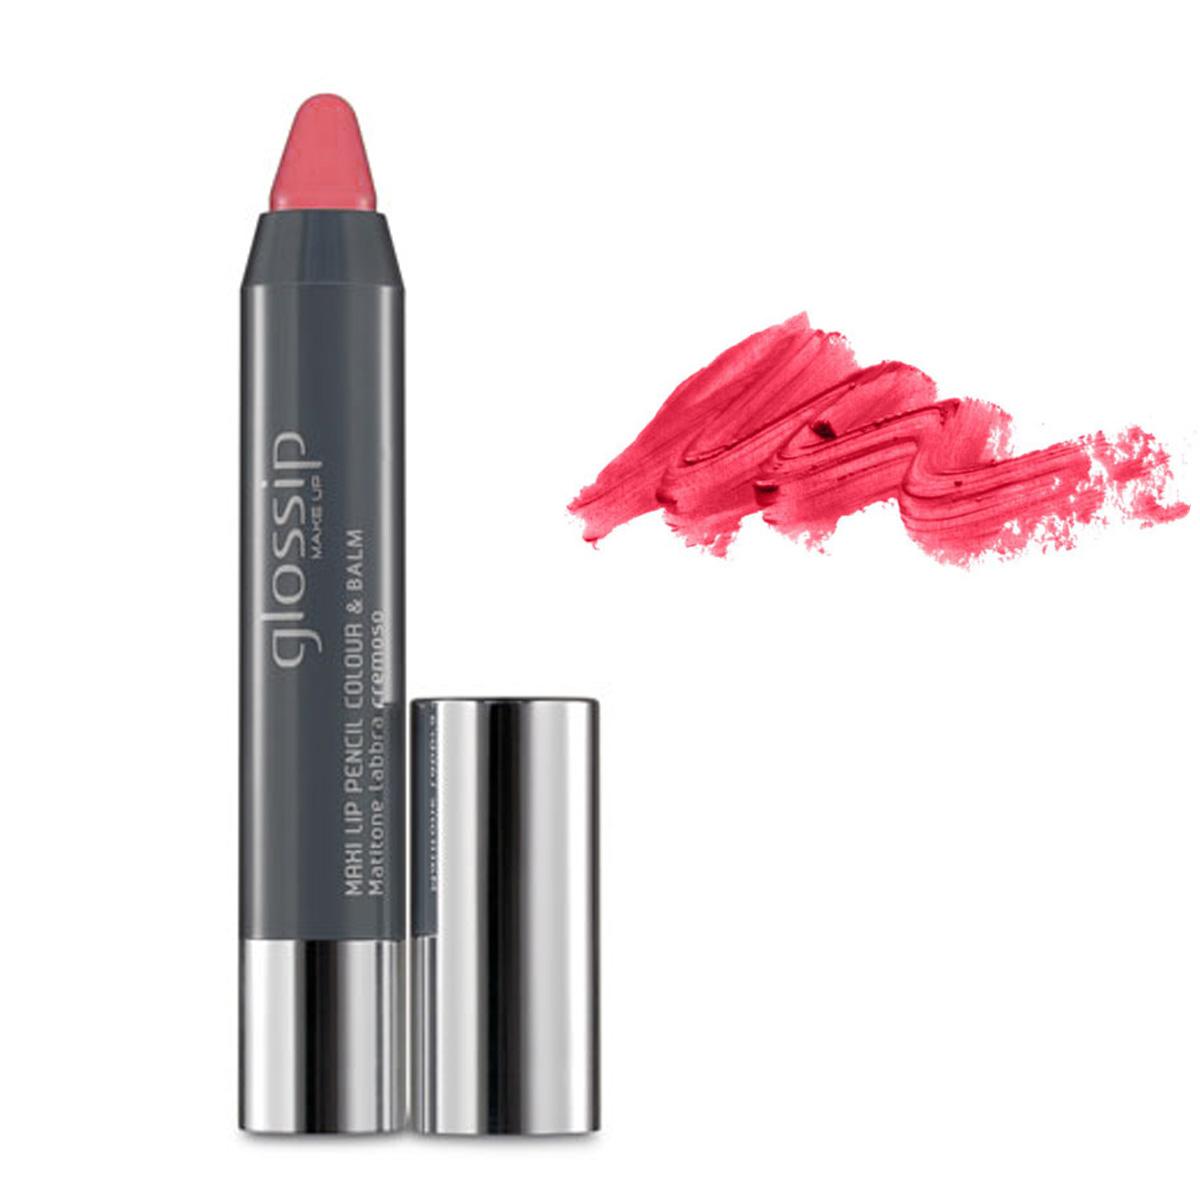 Creion de buze cremos, rosu zmeura - Glossip, 4 ML